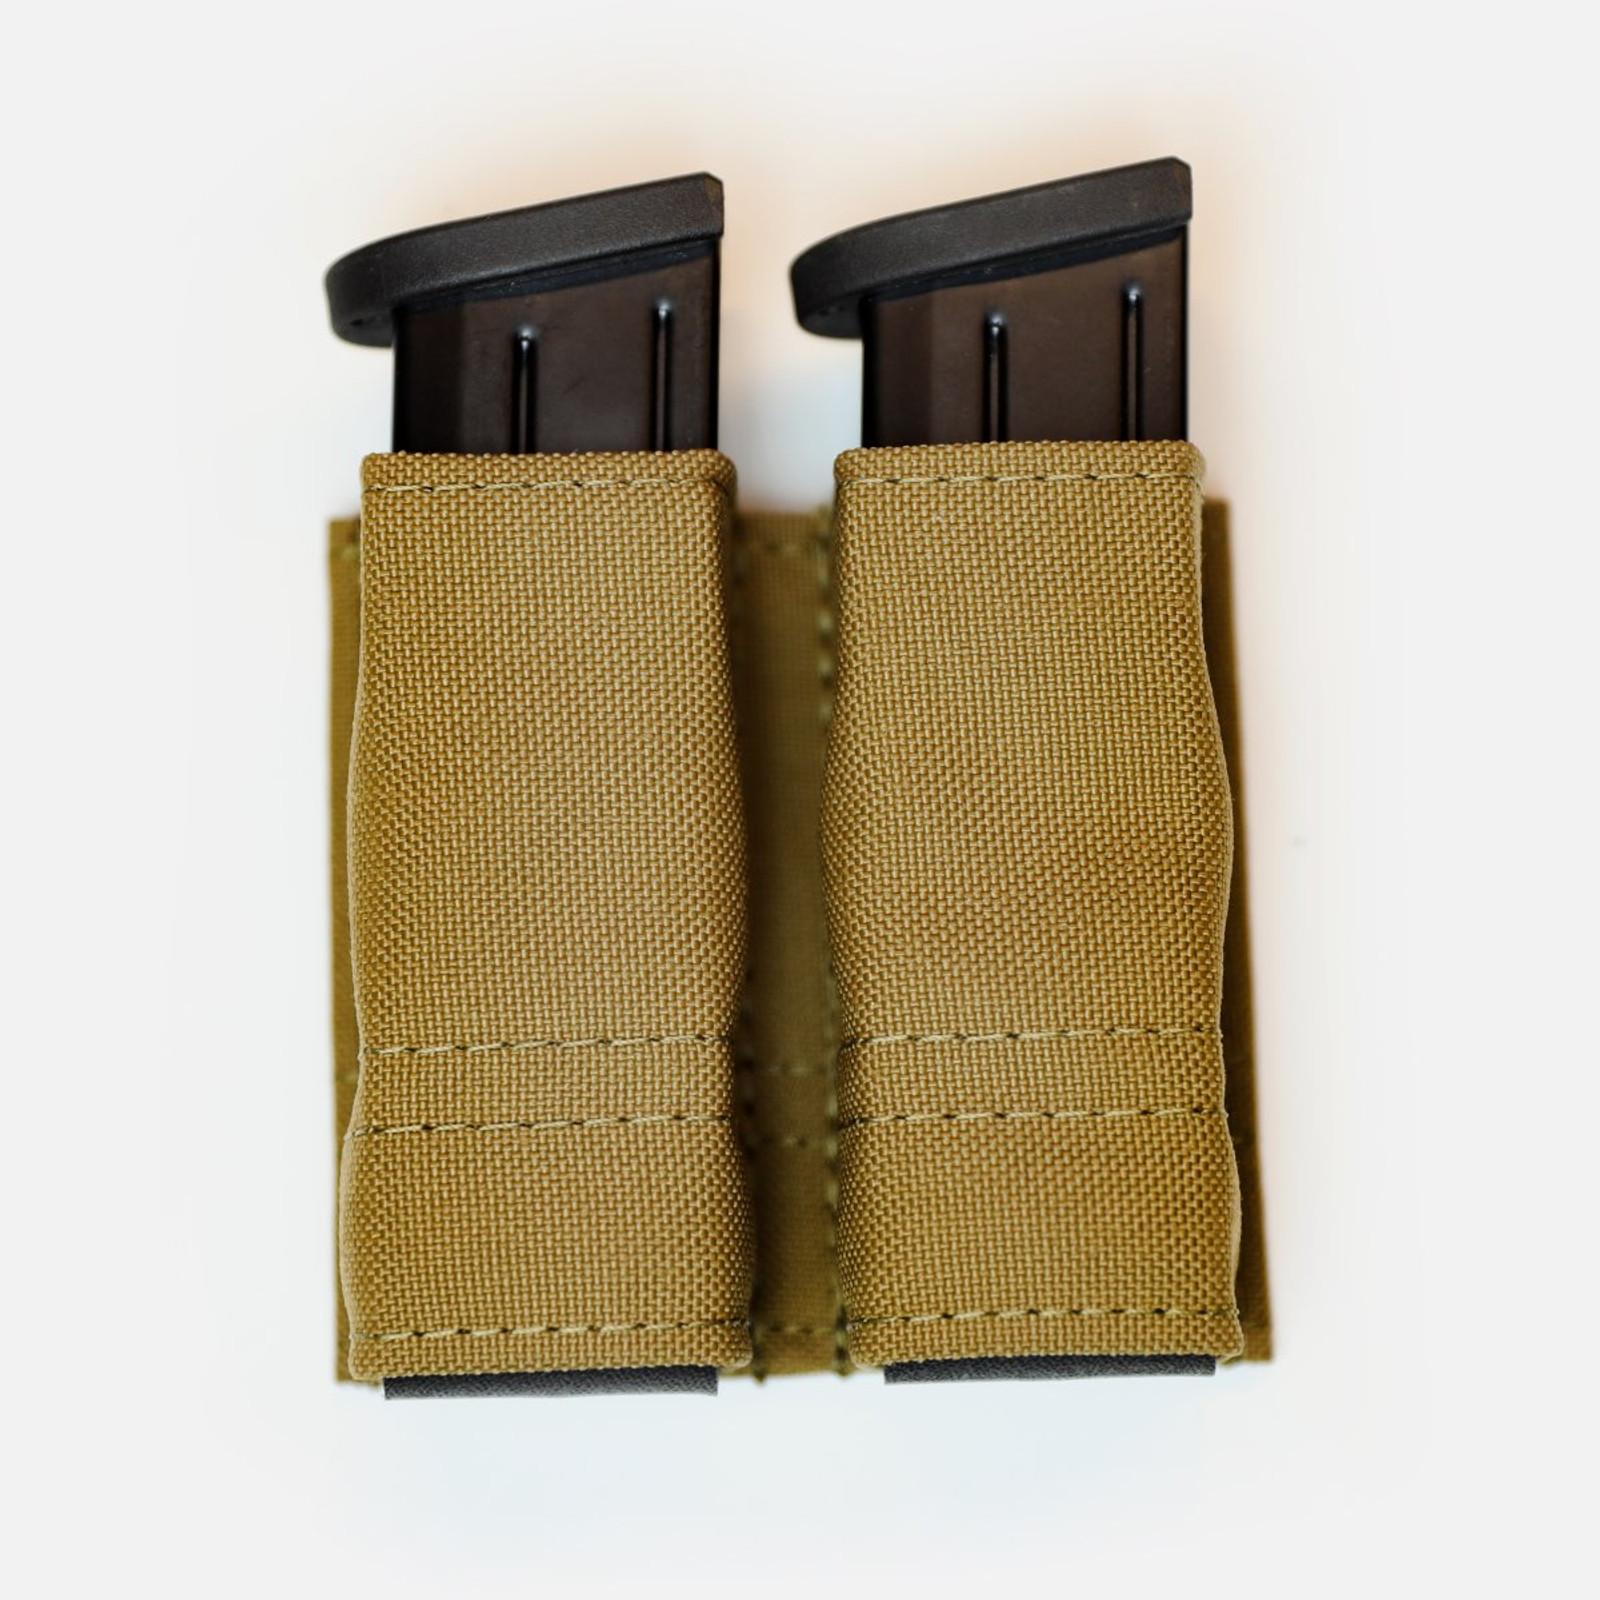 Double Pistol KYWI Magazine Pouch - esstac